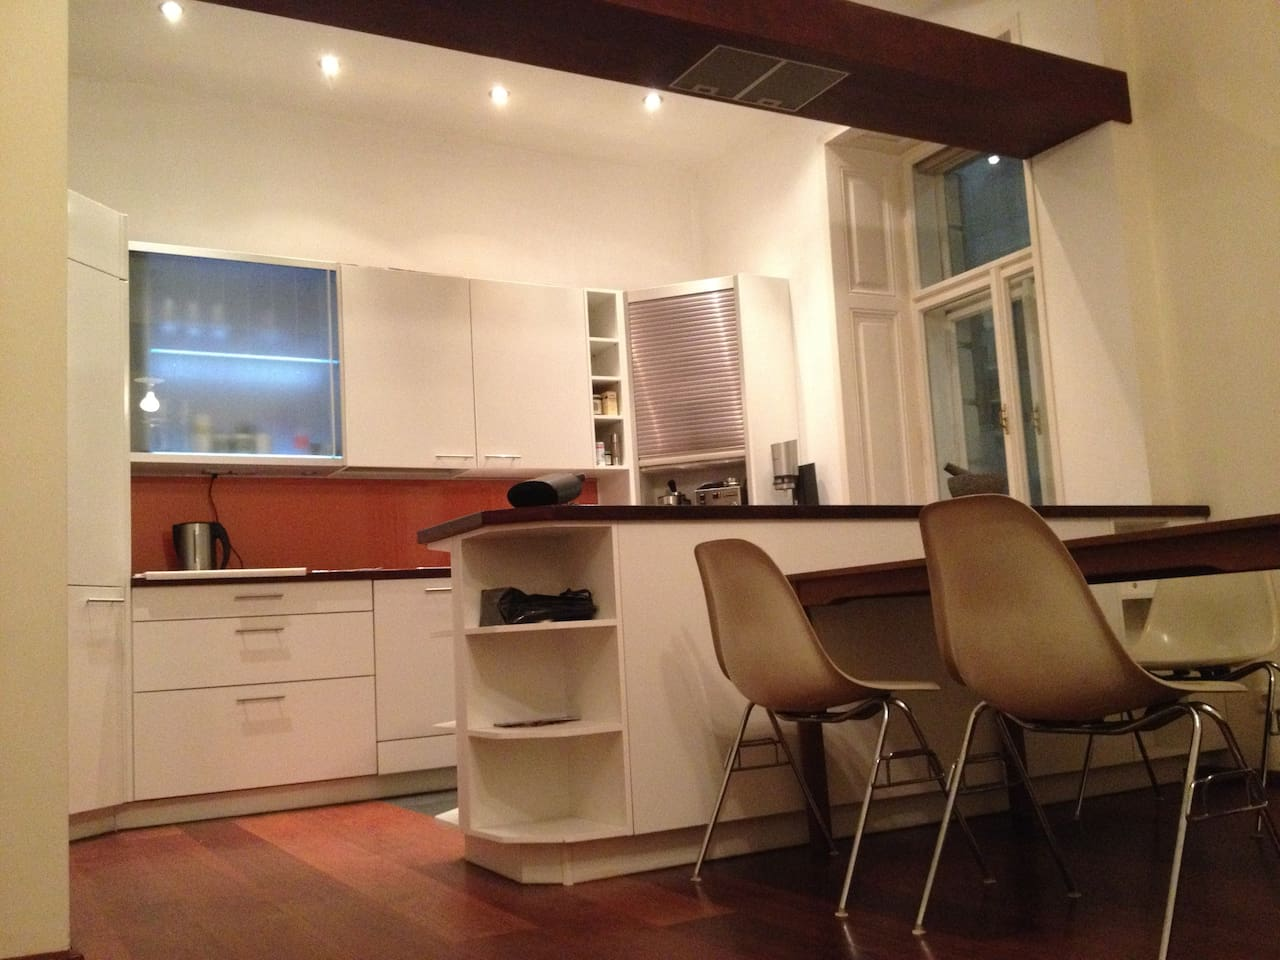 shared kitchen..